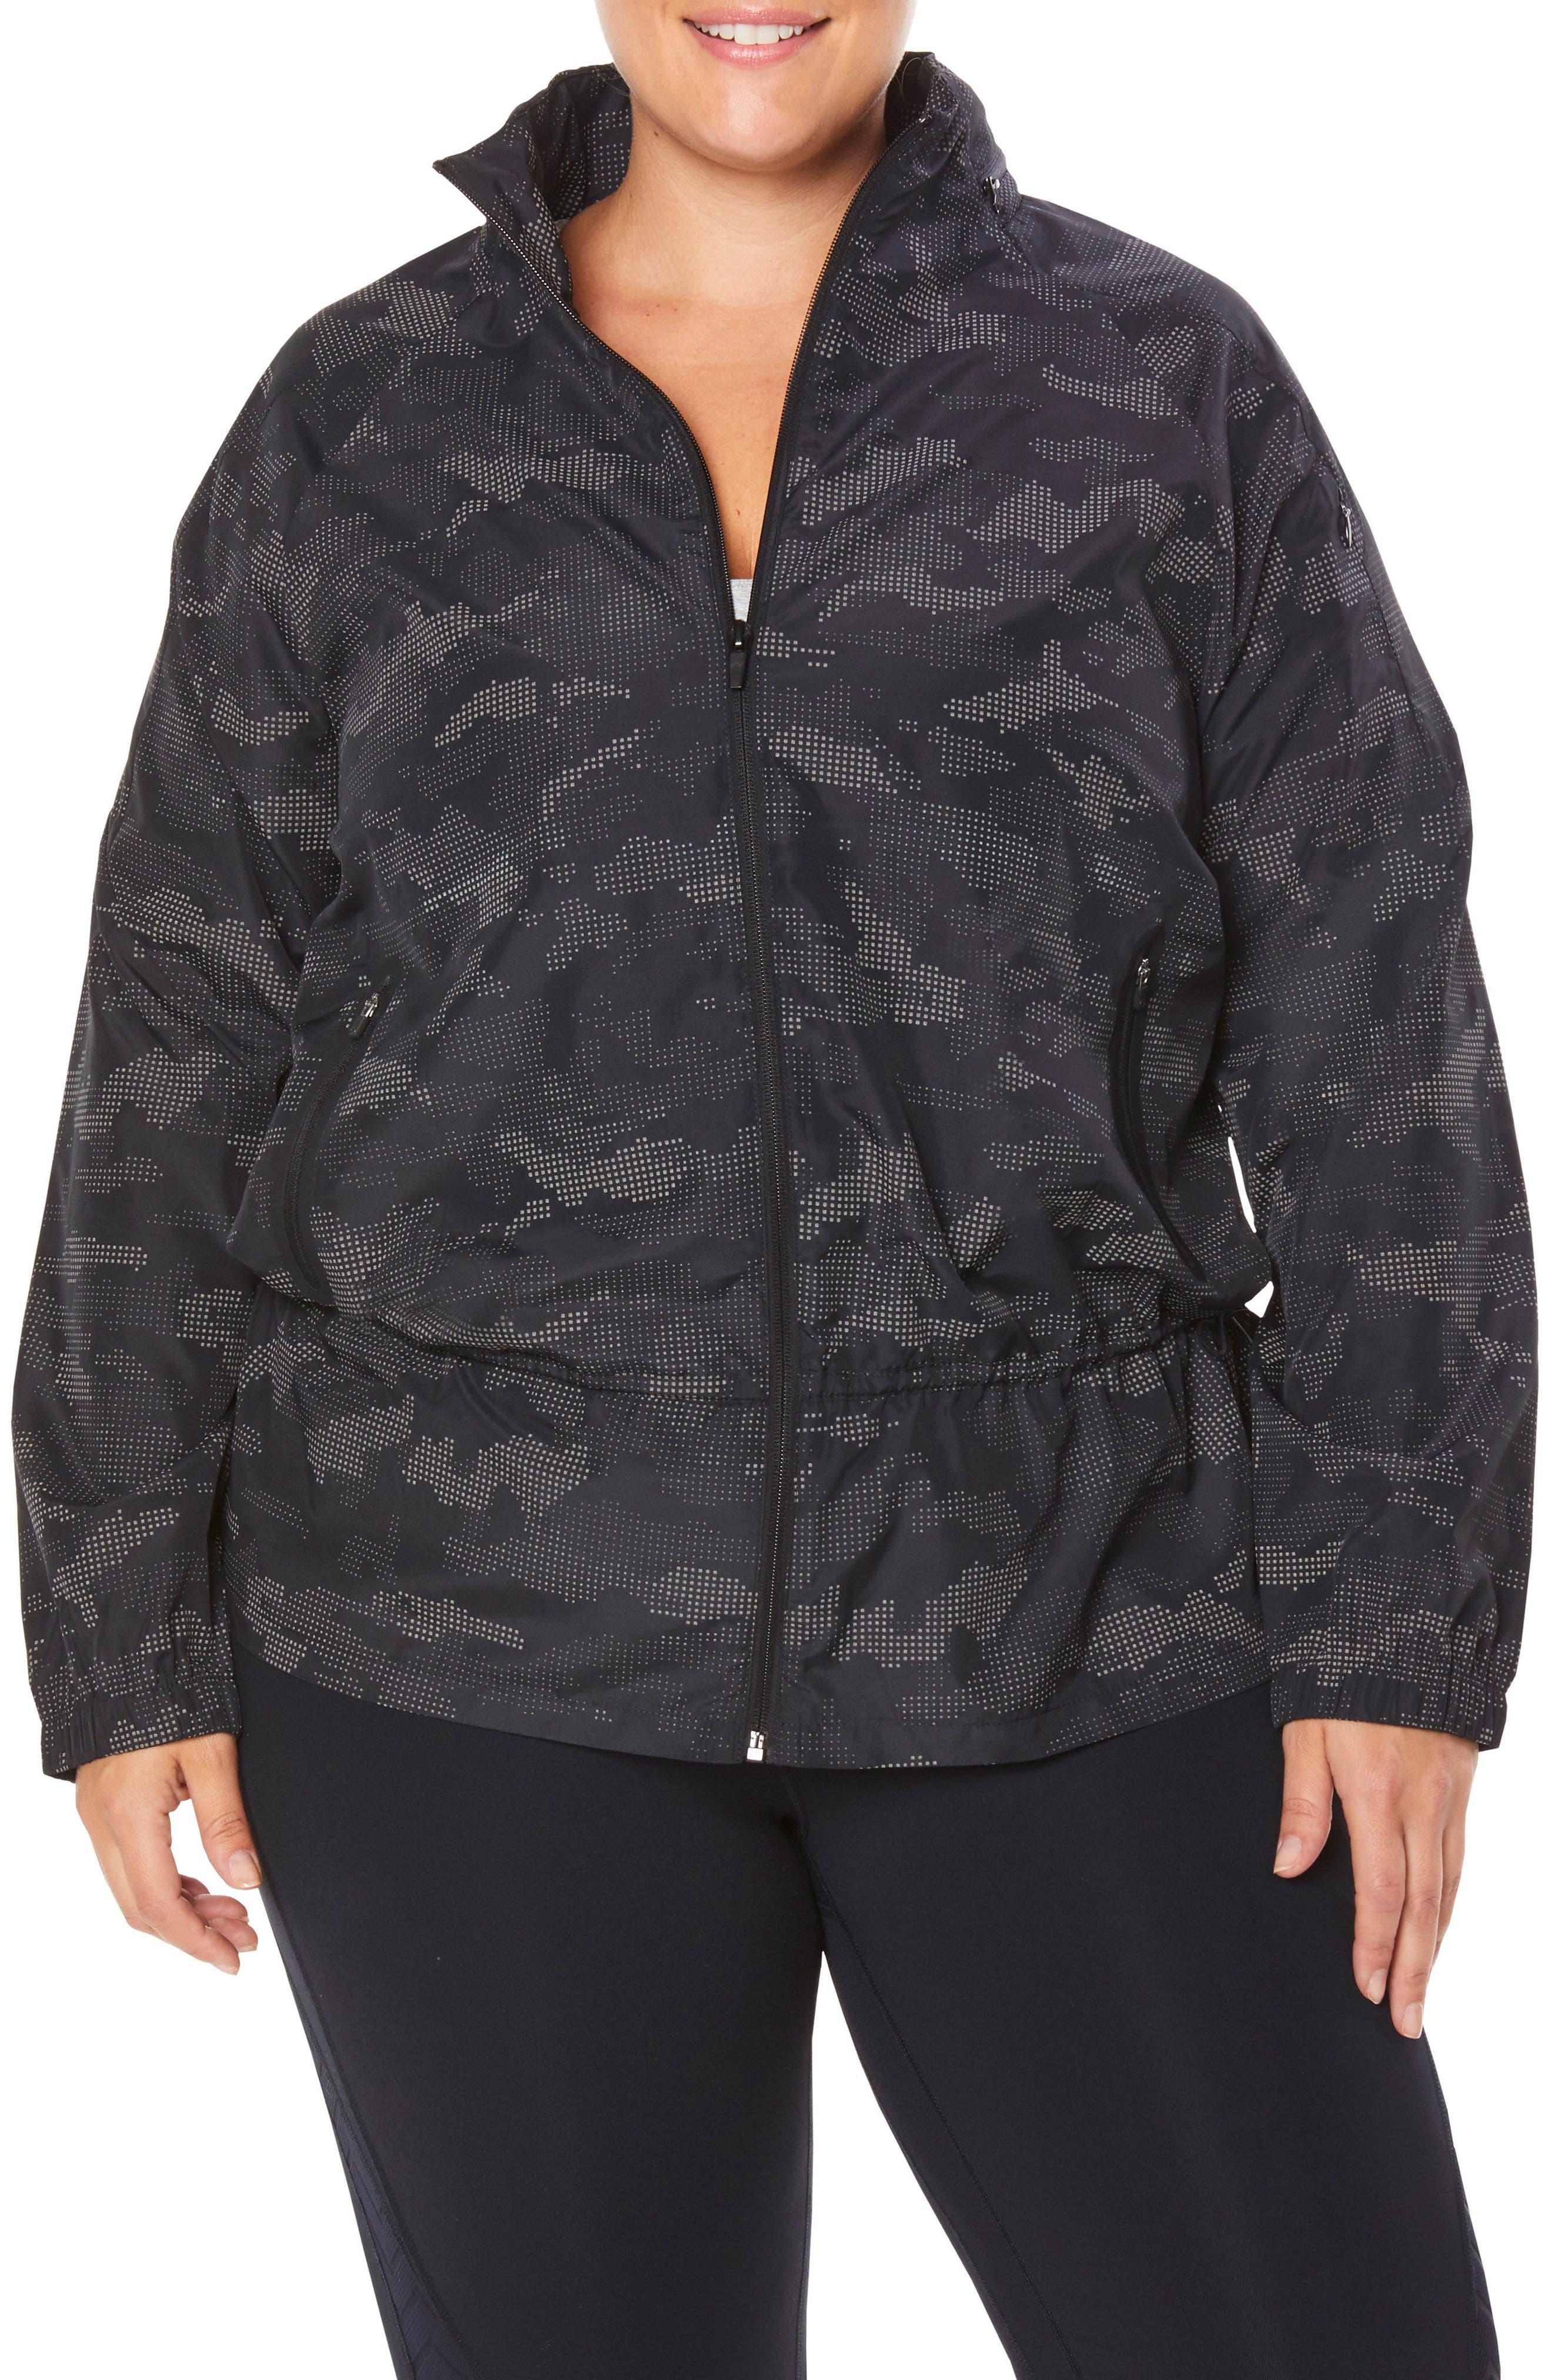 SHAPE ACTIVEWEAR Ghost Windbreaker Jacket, Main, color, 001